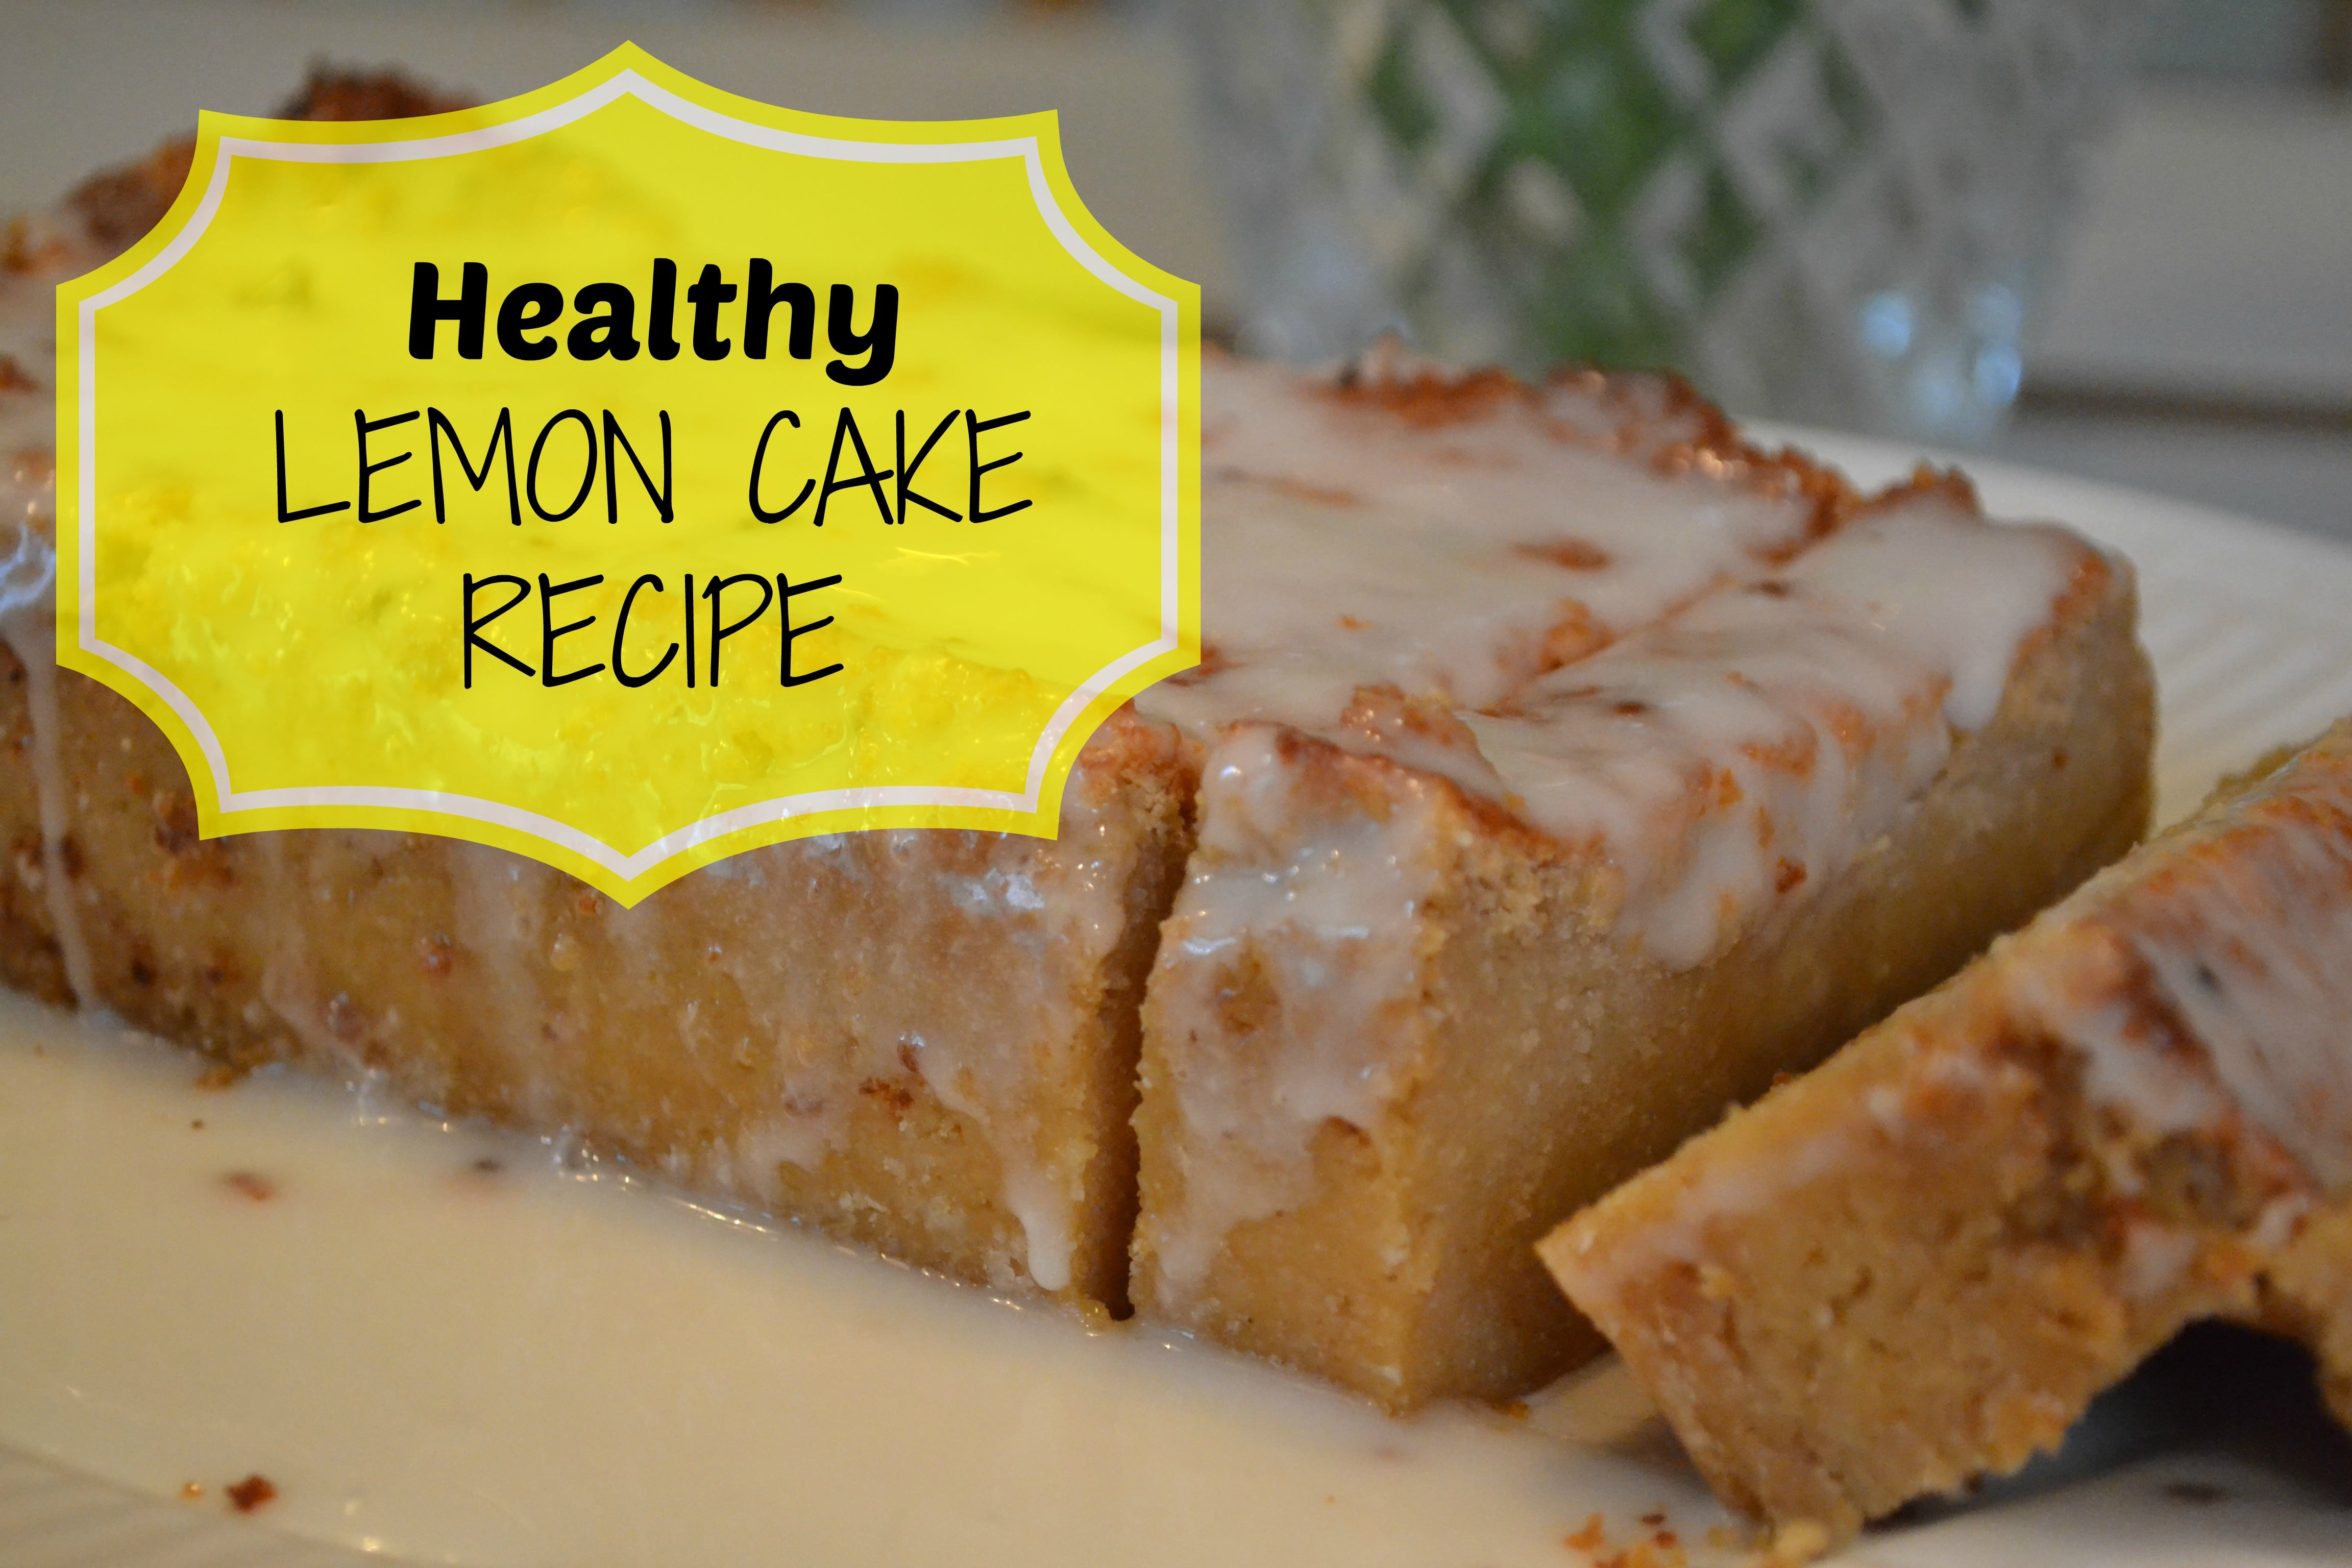 Healthy Lemon Dessert Recipes  Healthy Lemon Cake Recipe